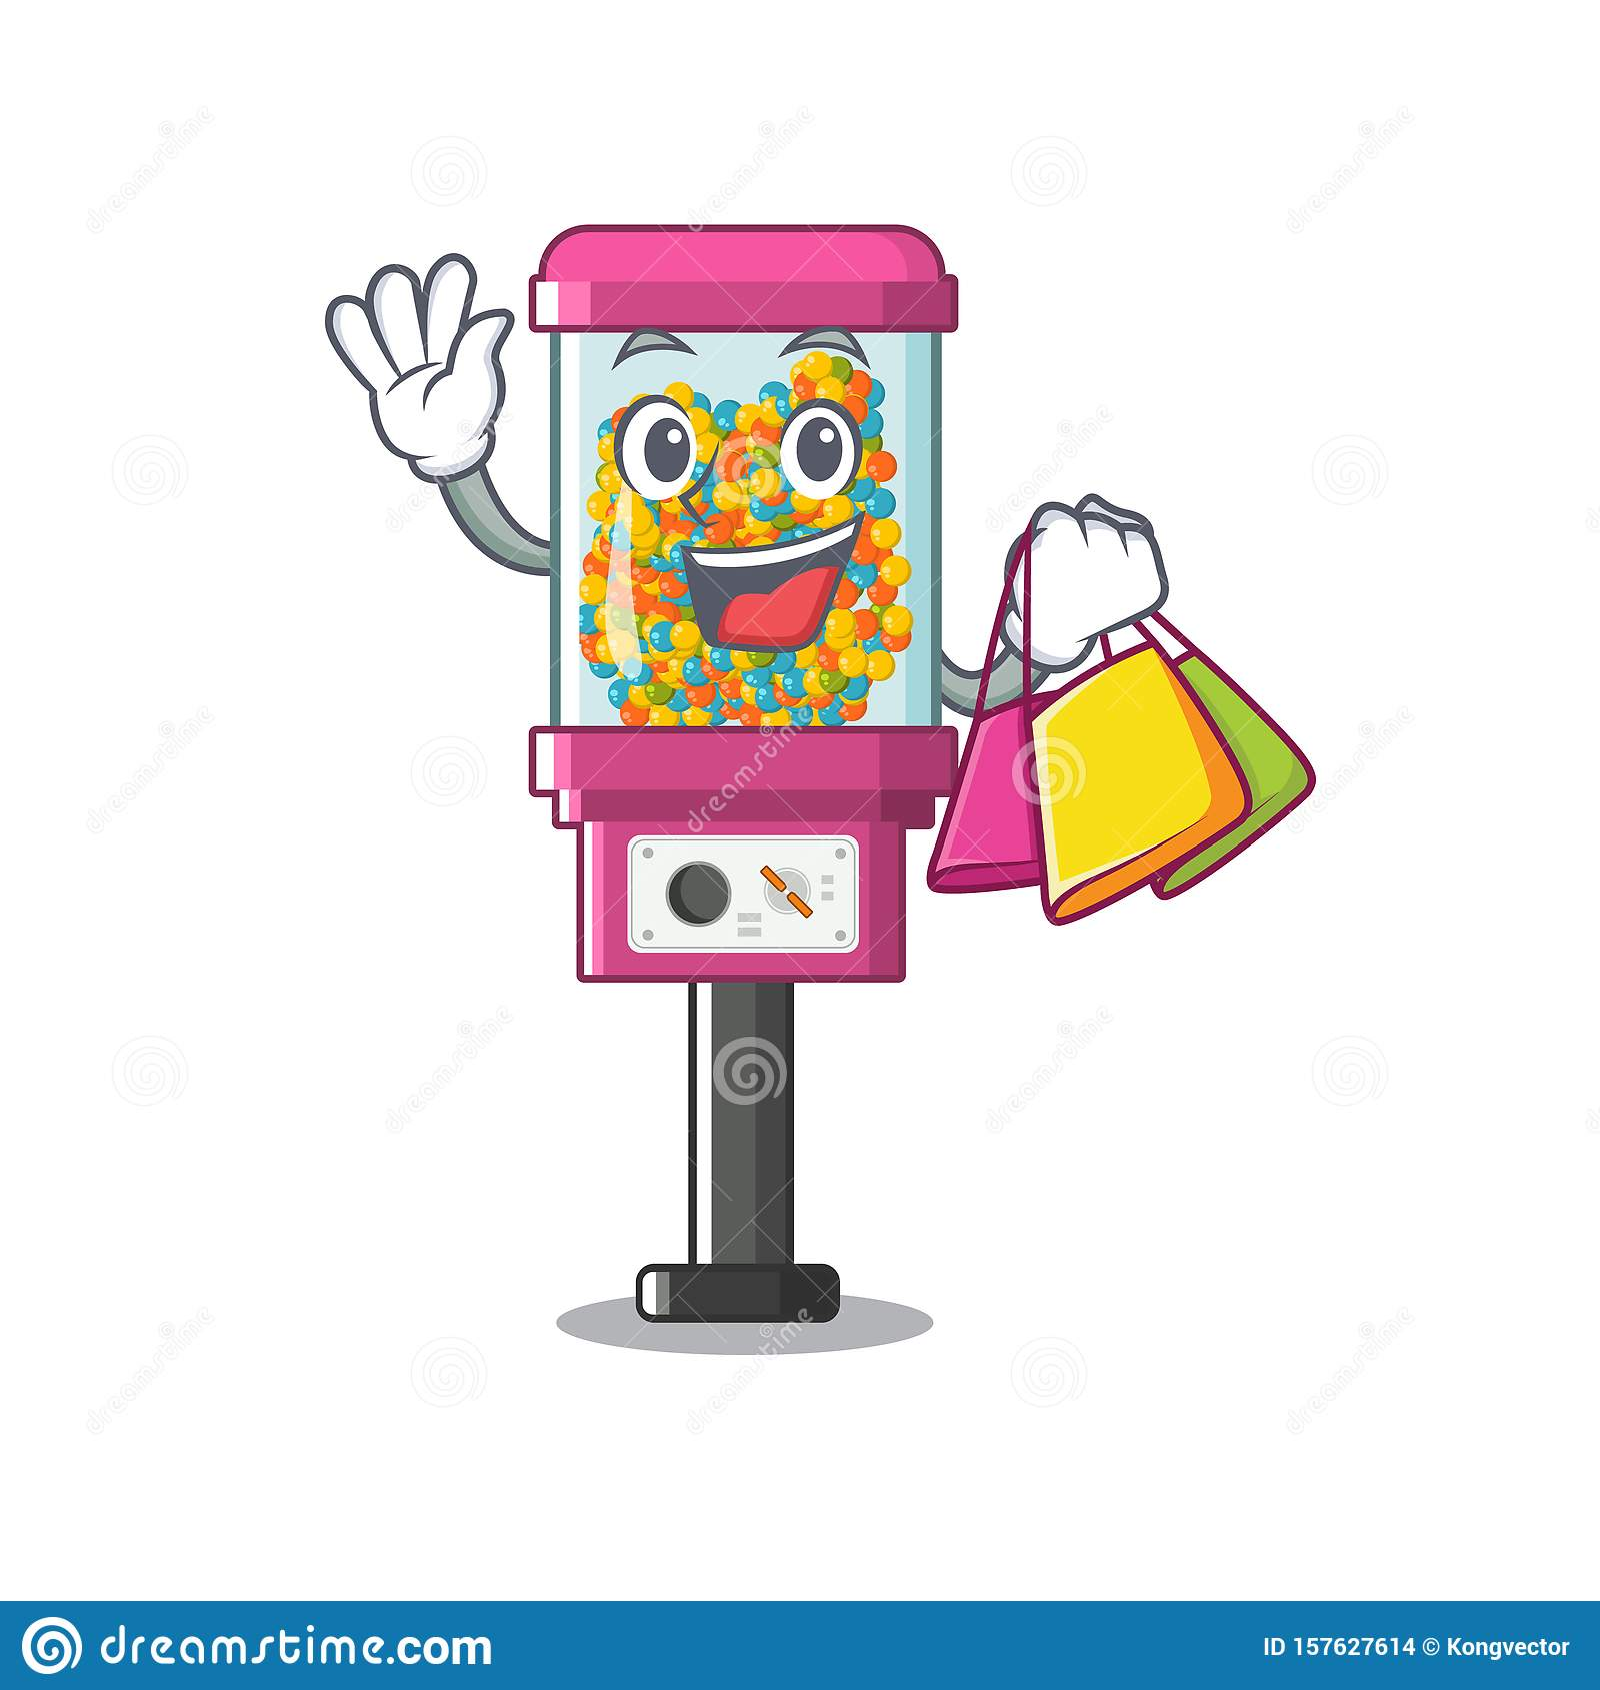 Shopping candy vending machine in a cartoon